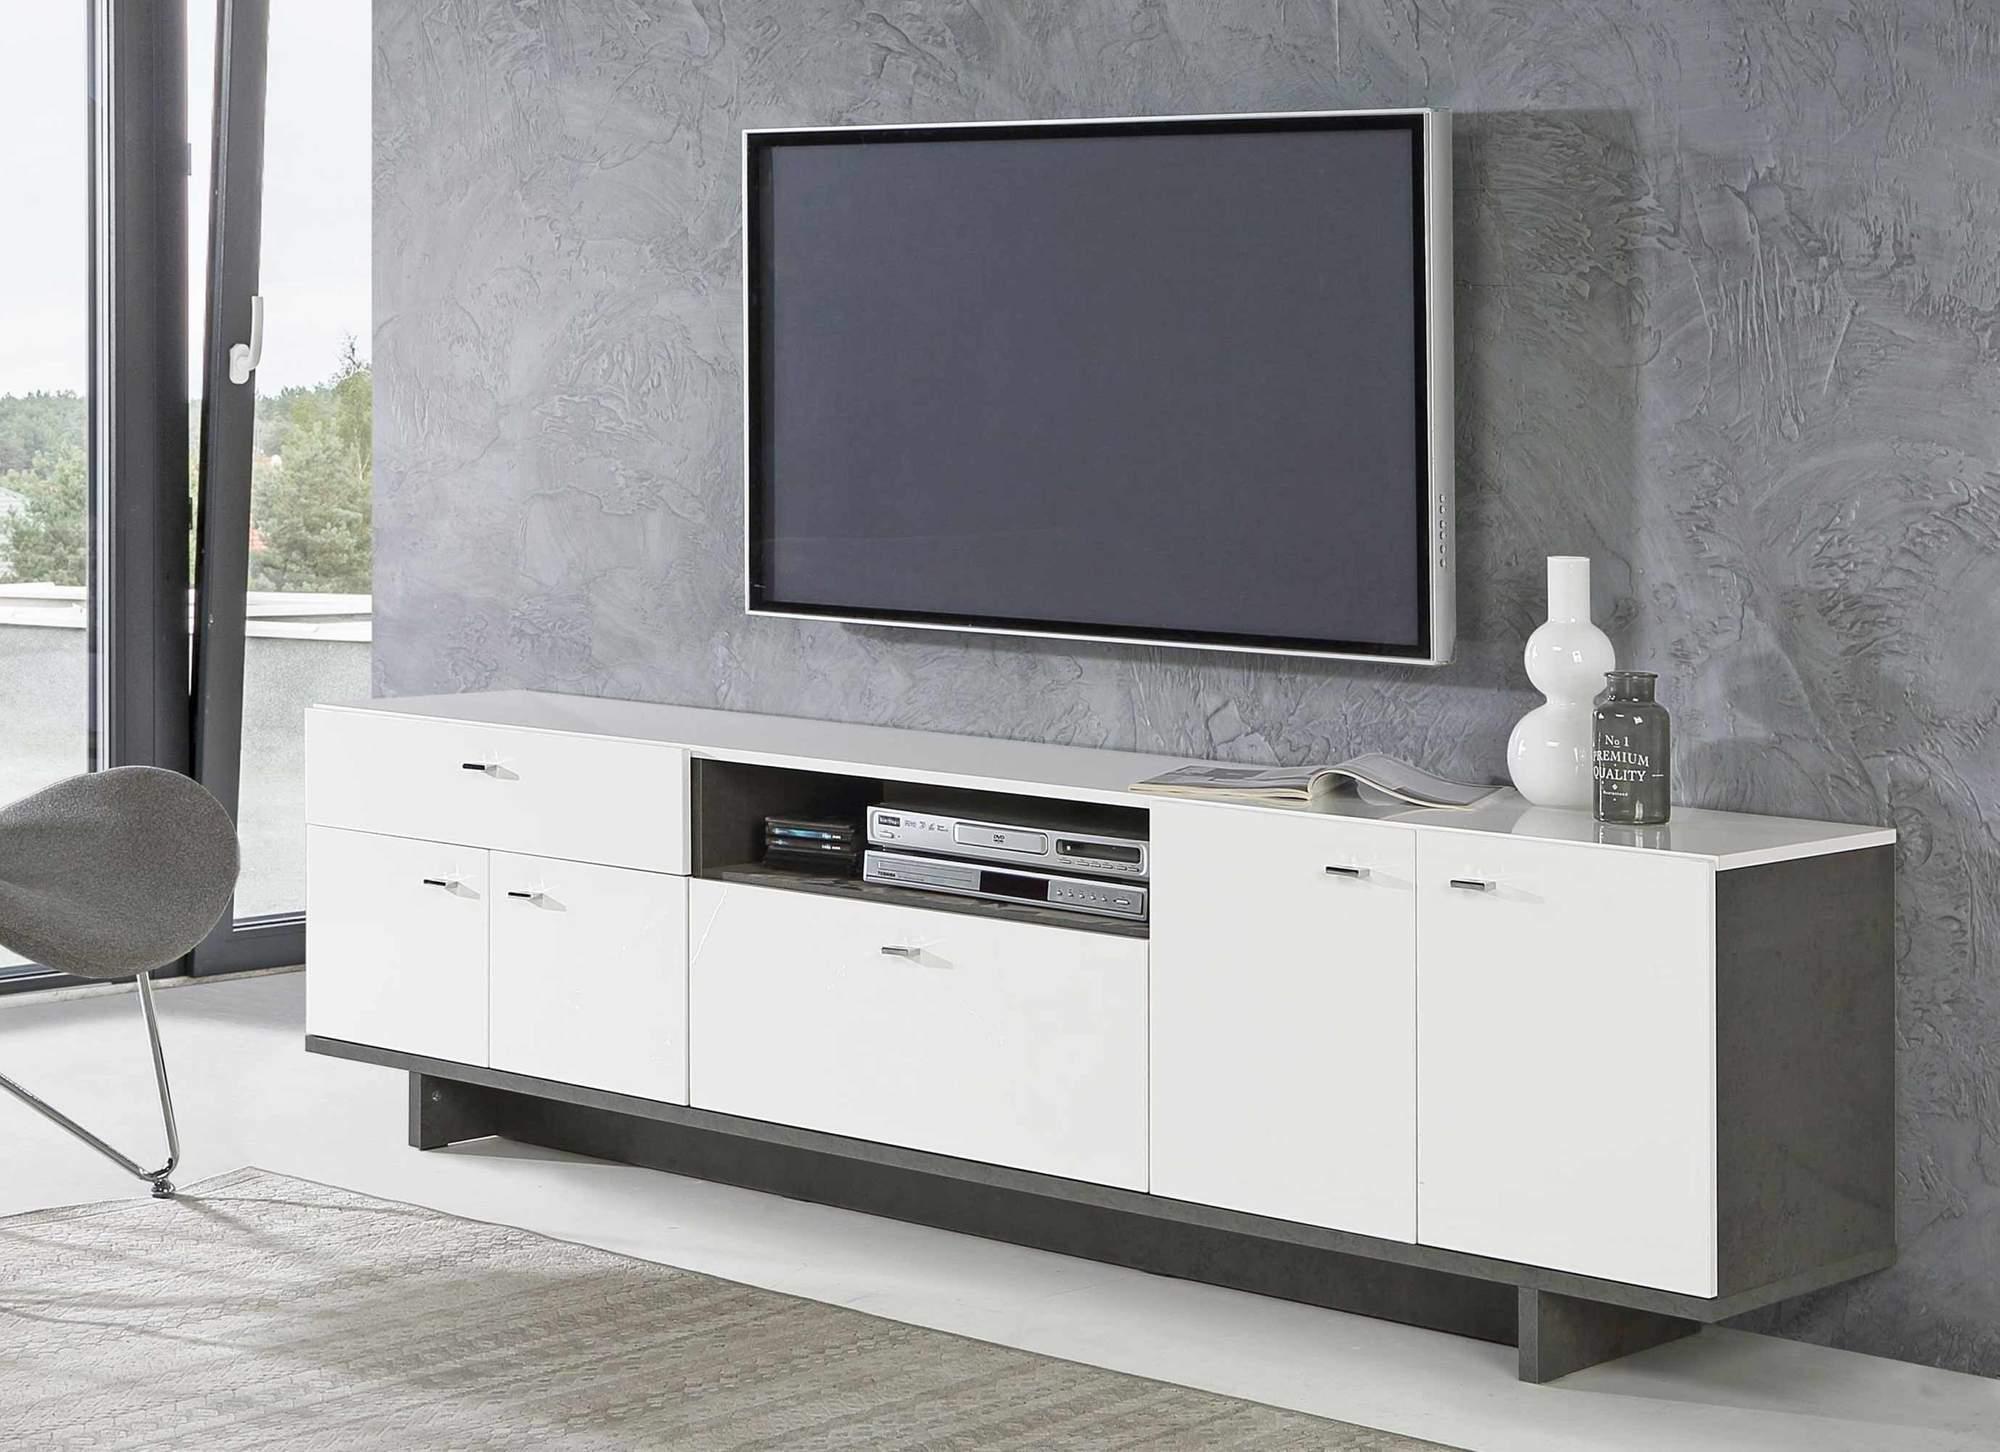 Lowboard Makaria 4 Trg Tv Kommode In Betonoptik Weiss Glanzend